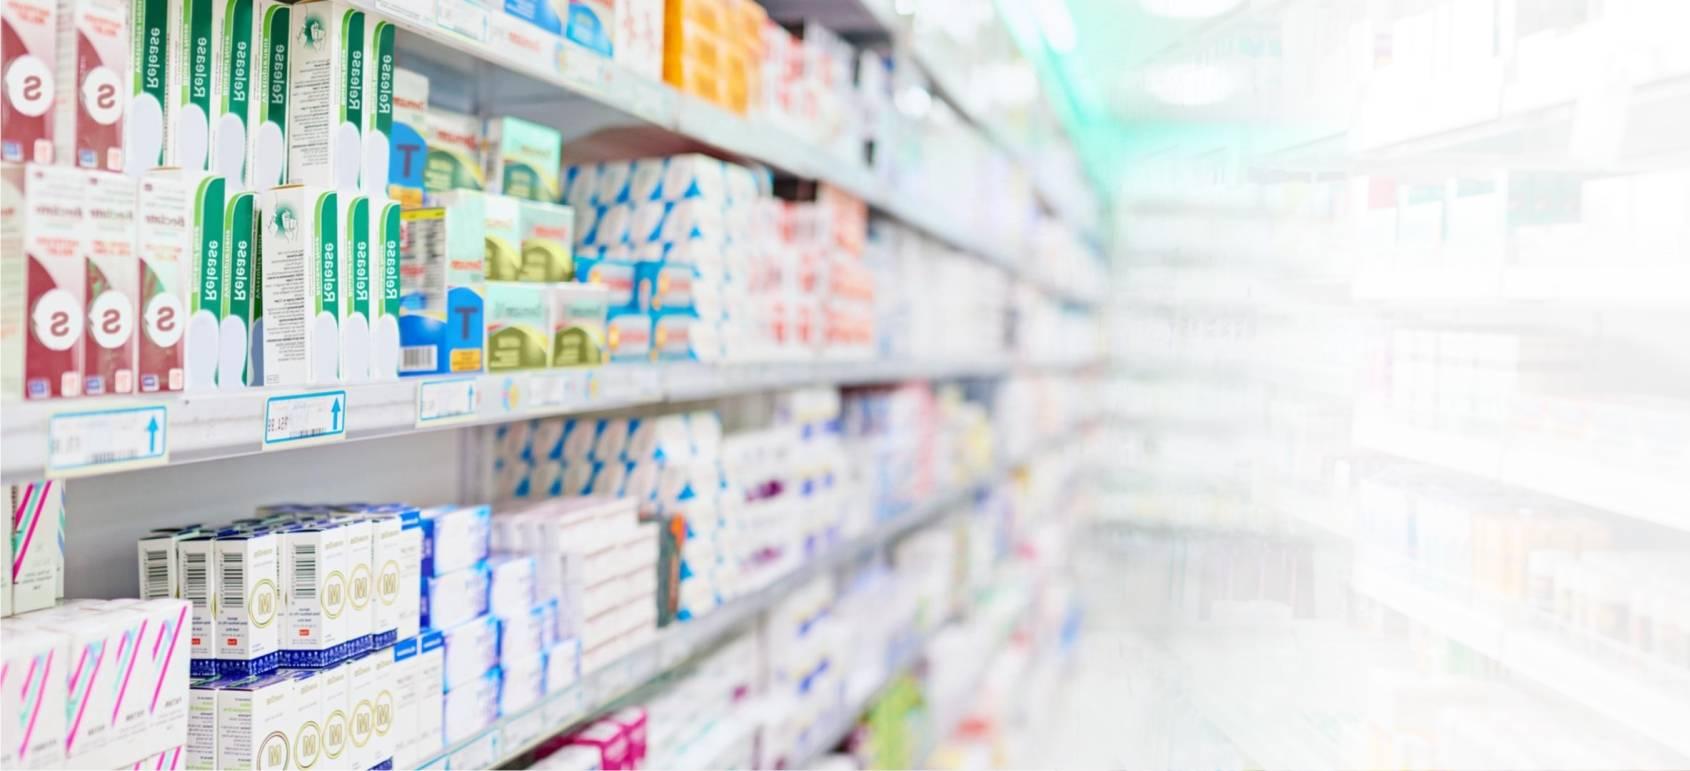 Buy Drugs Online & we'll deliver at your Doorstep